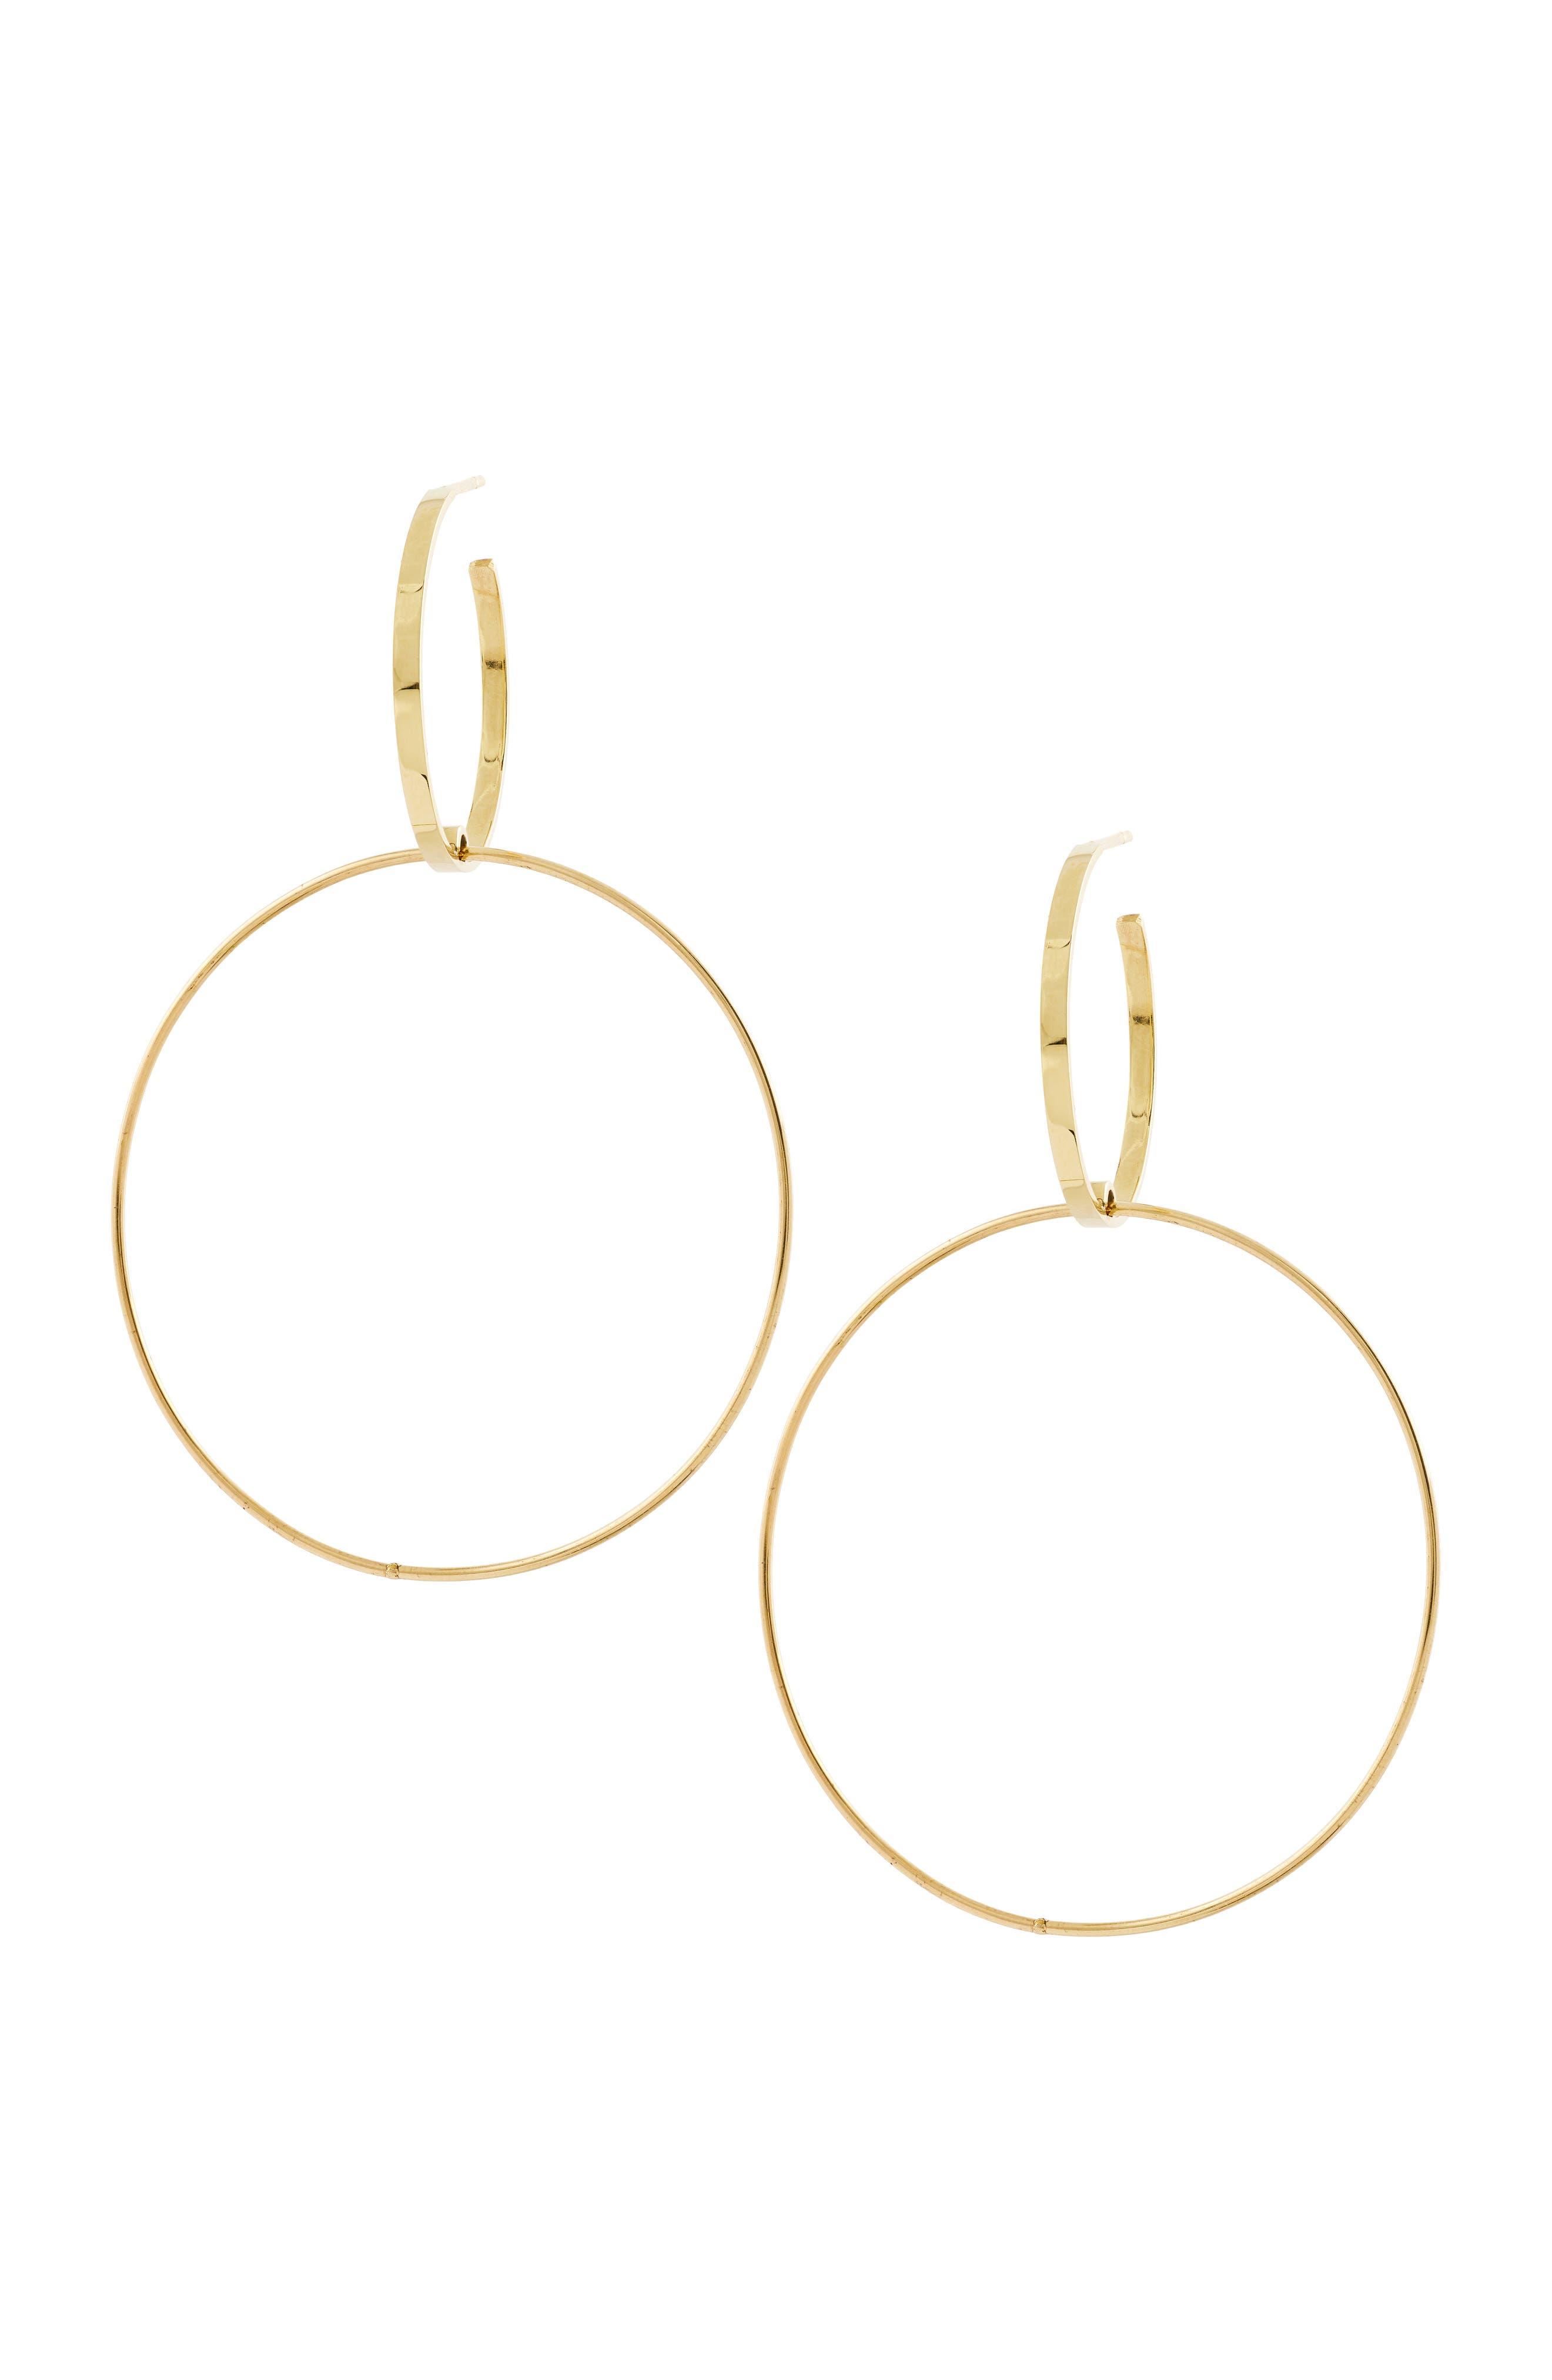 Main Image - Lana Jewelry Double Bond Hoop Earrings